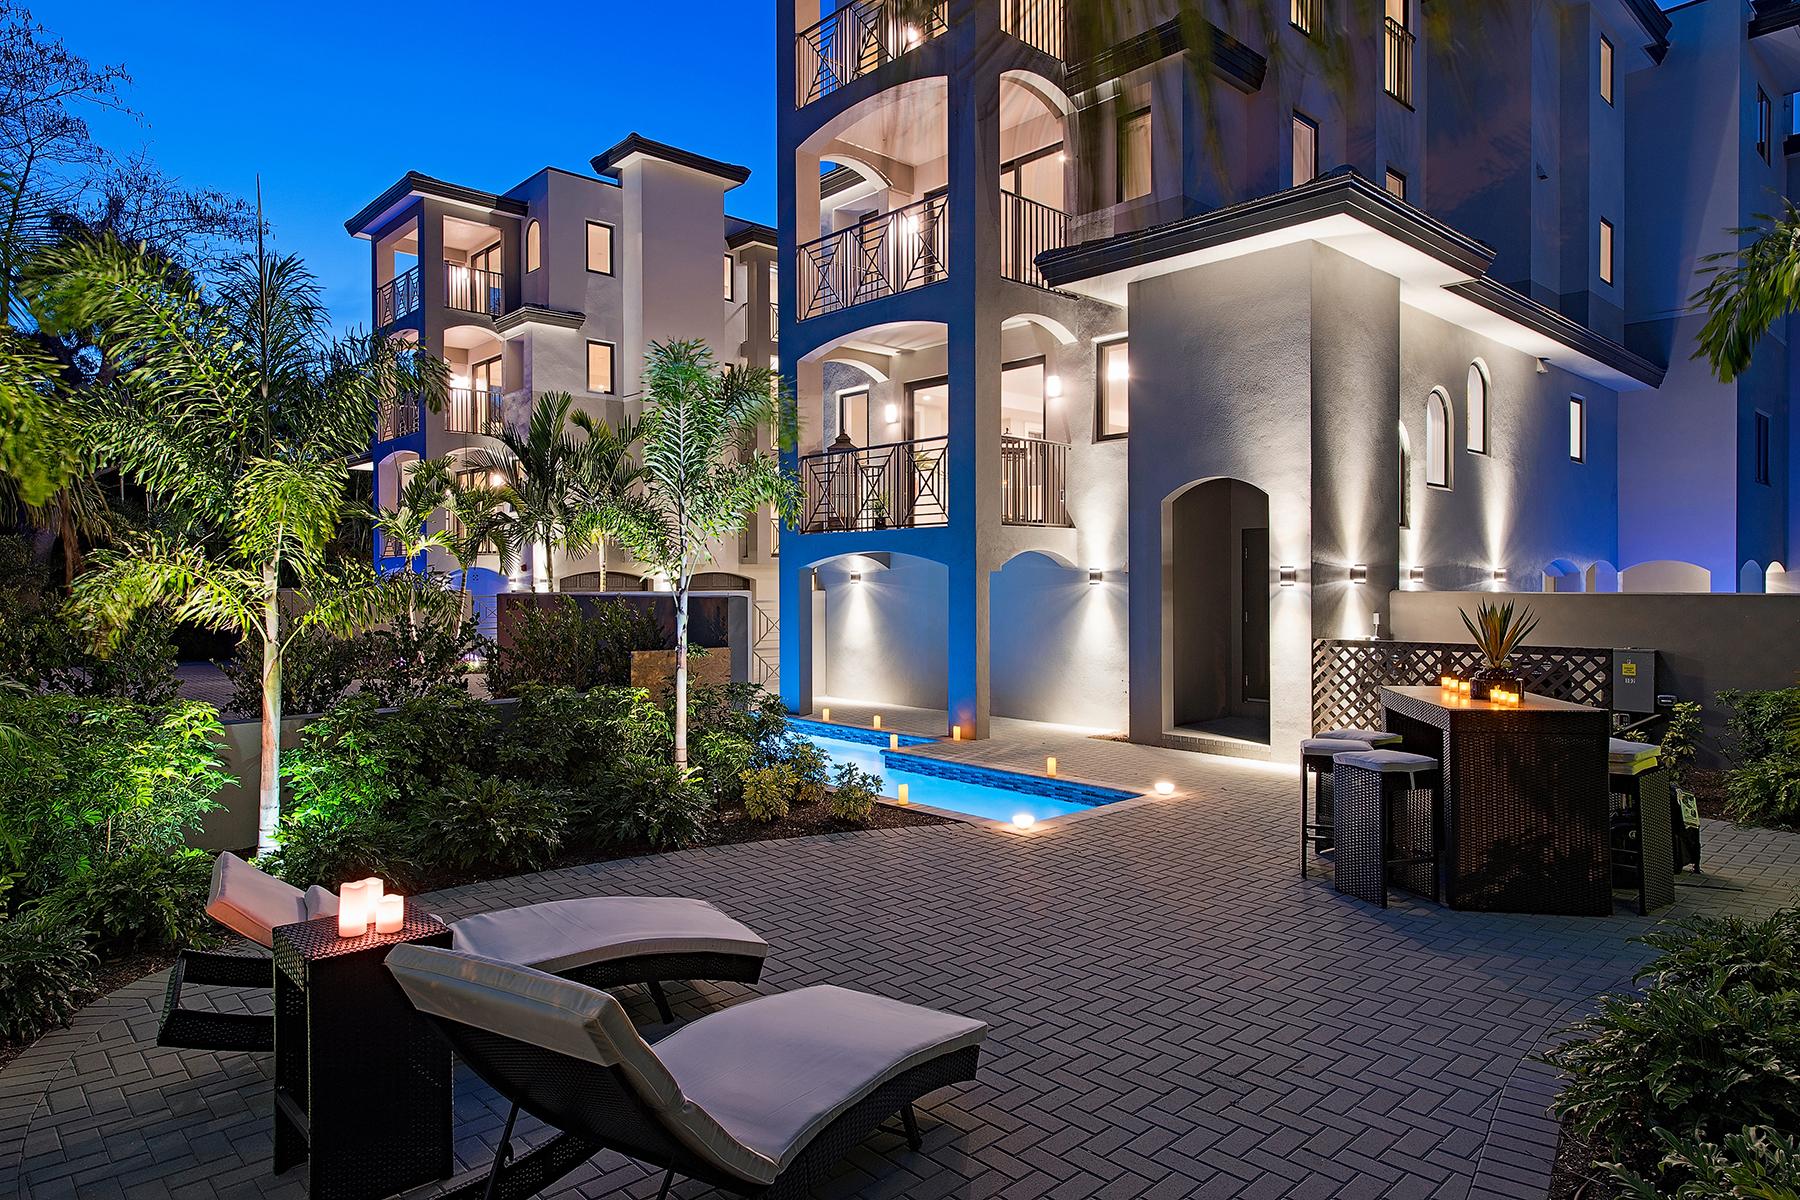 Condominium for Sale at OLD NAPLES - ESMERALDA ON EIGHTH 969 8th Ave S 201, Naples, Florida 34102 United States